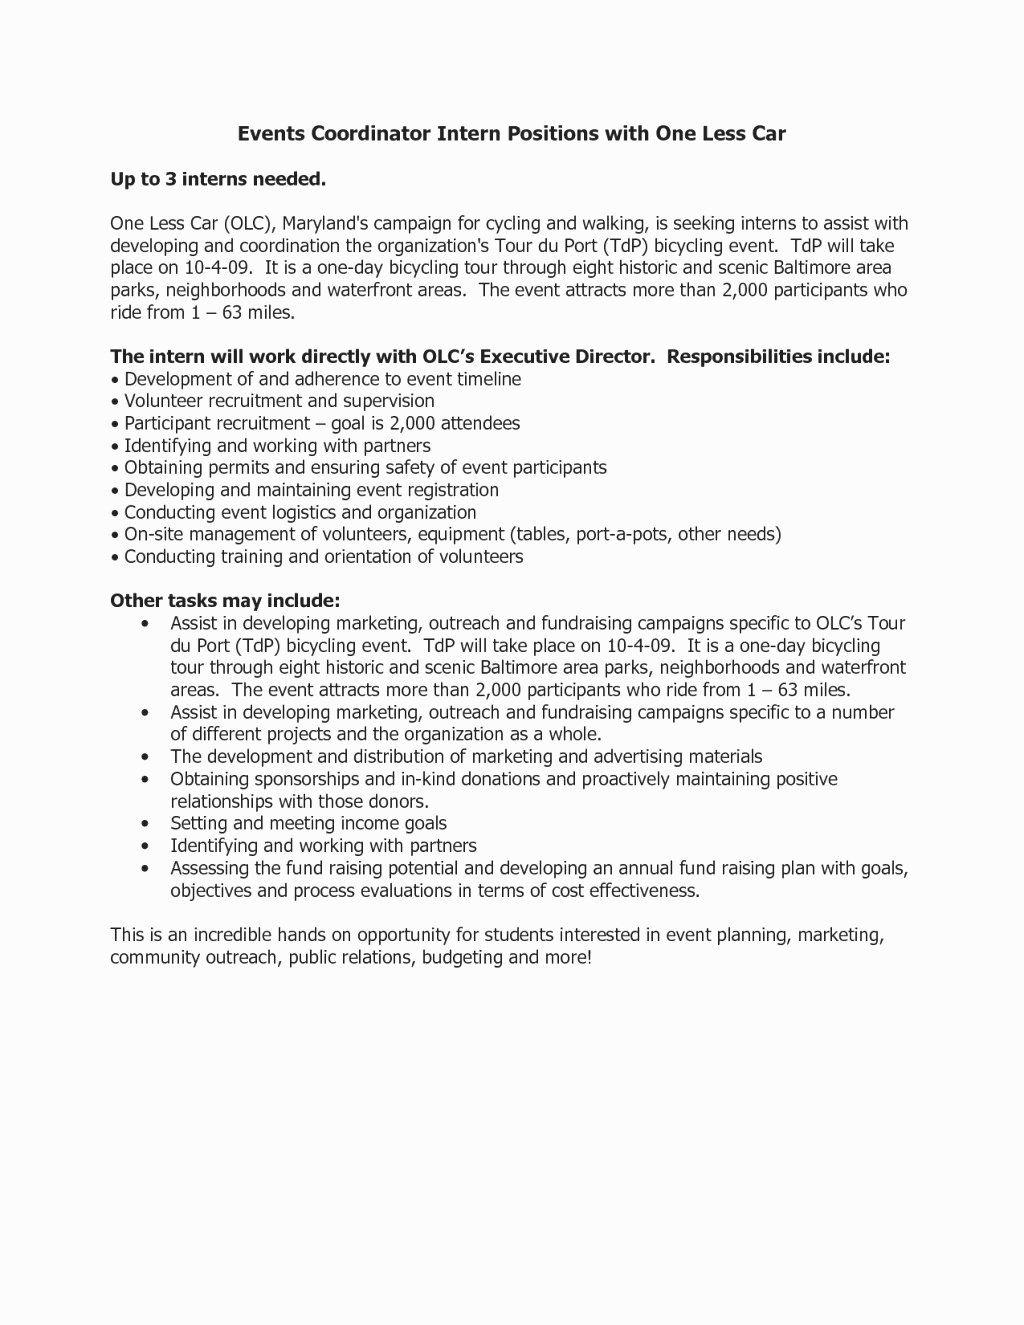 Firefighter Job Description Resume Awesome Wildland